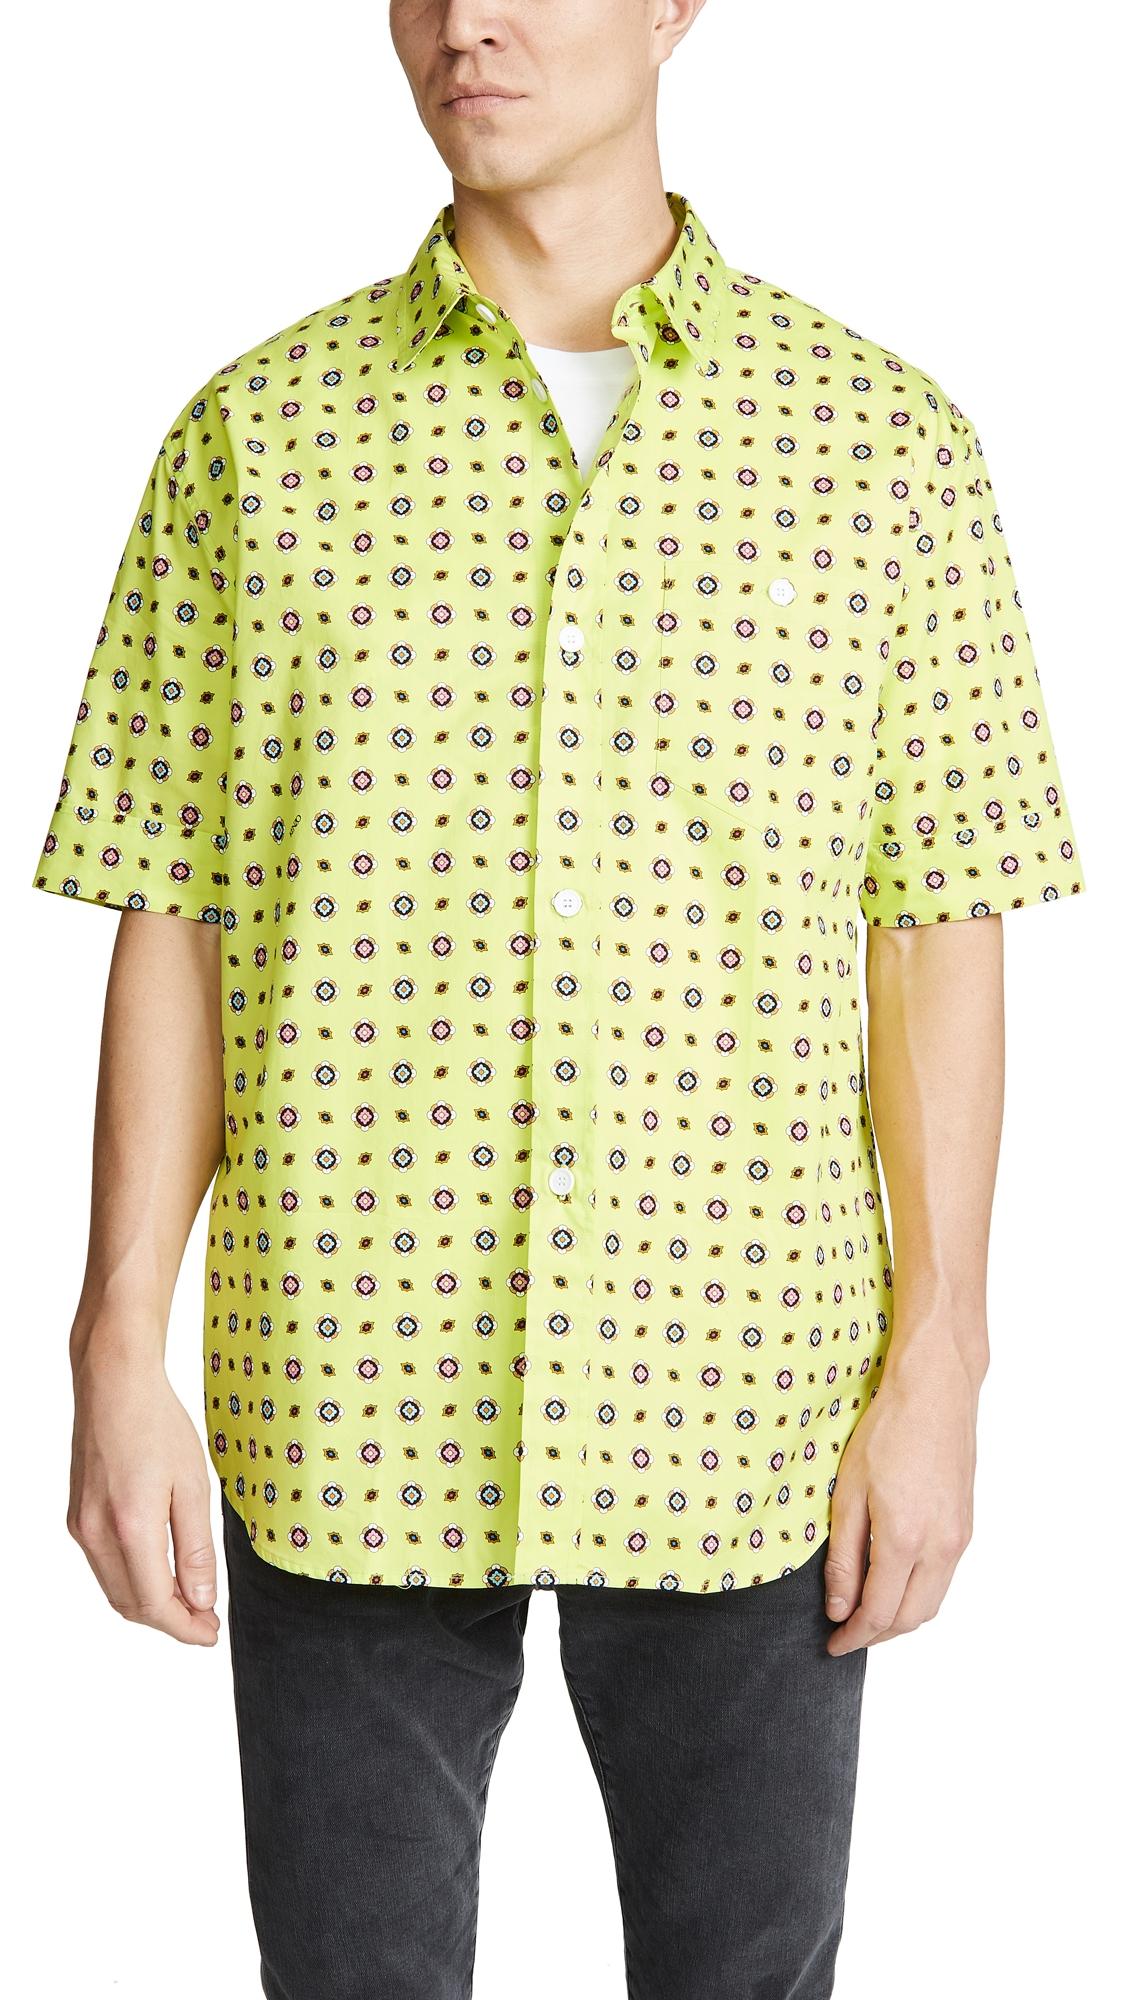 KENZO Casual Short Sleeve Shirt